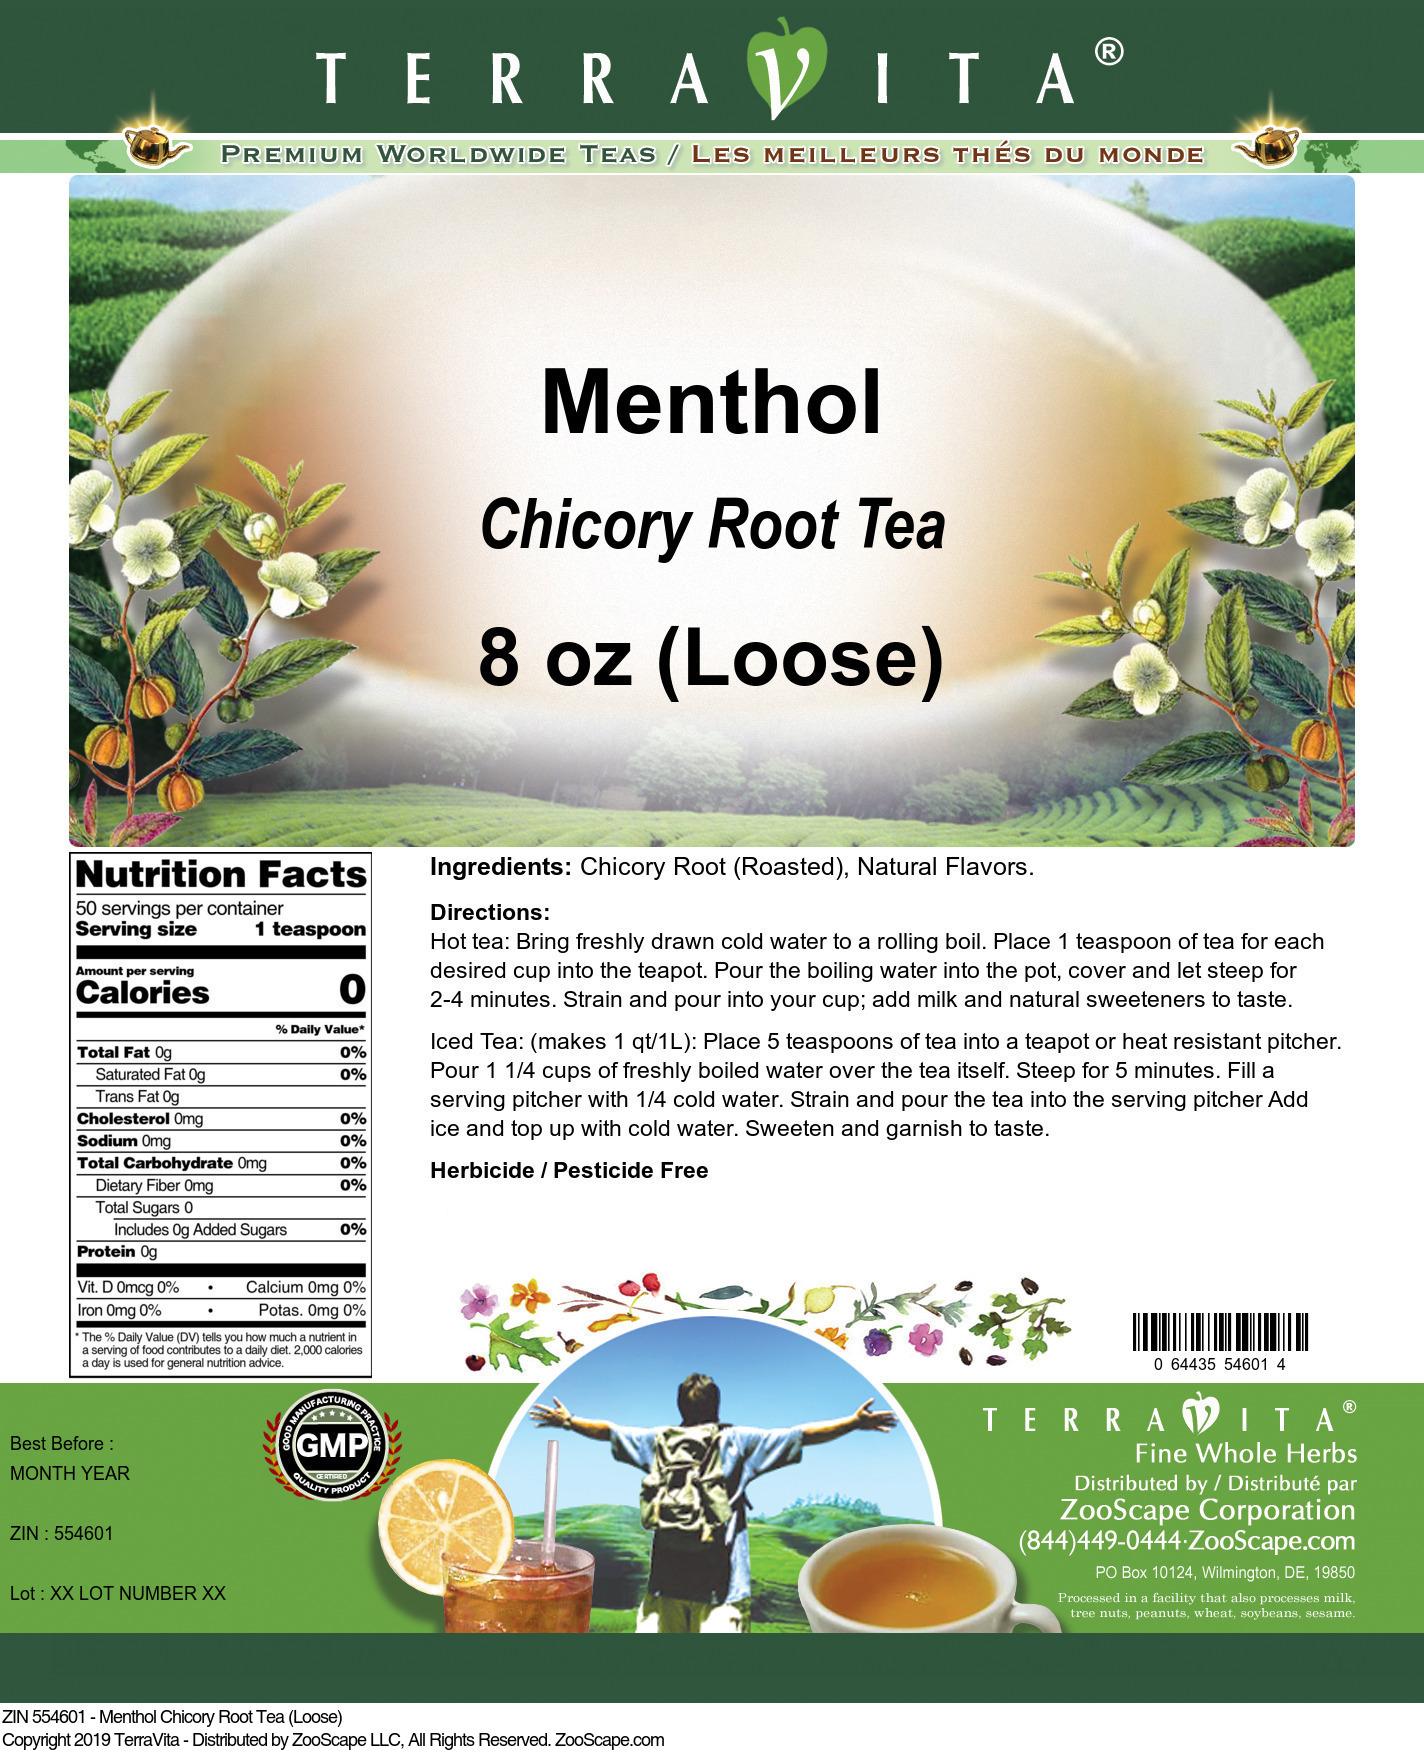 Menthol Chicory Root Tea (Loose)